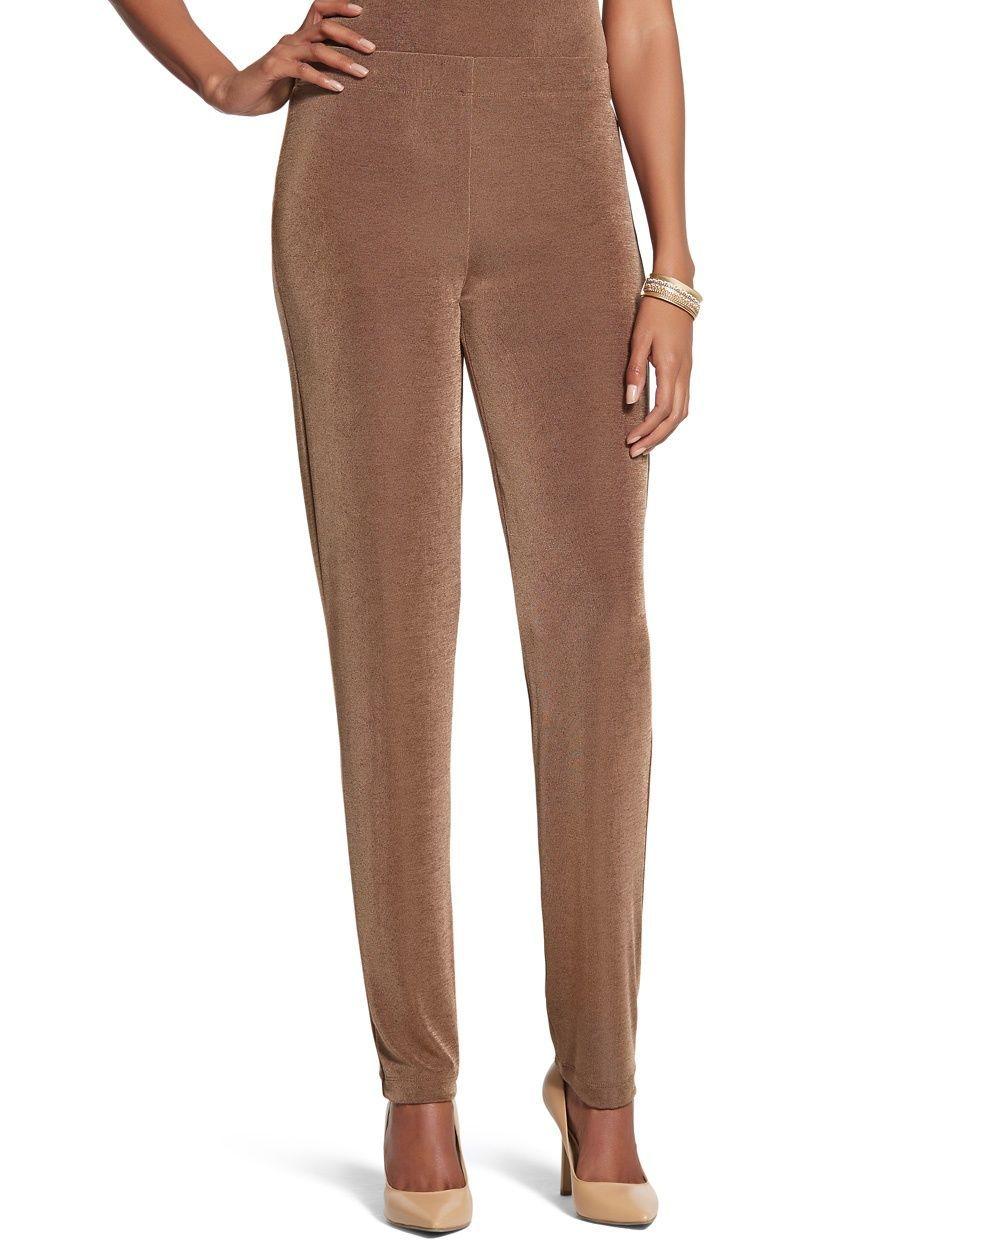 6f25aca113 Chico s Women s Travelers Classic Essential Slim Pants in Heather Jasp